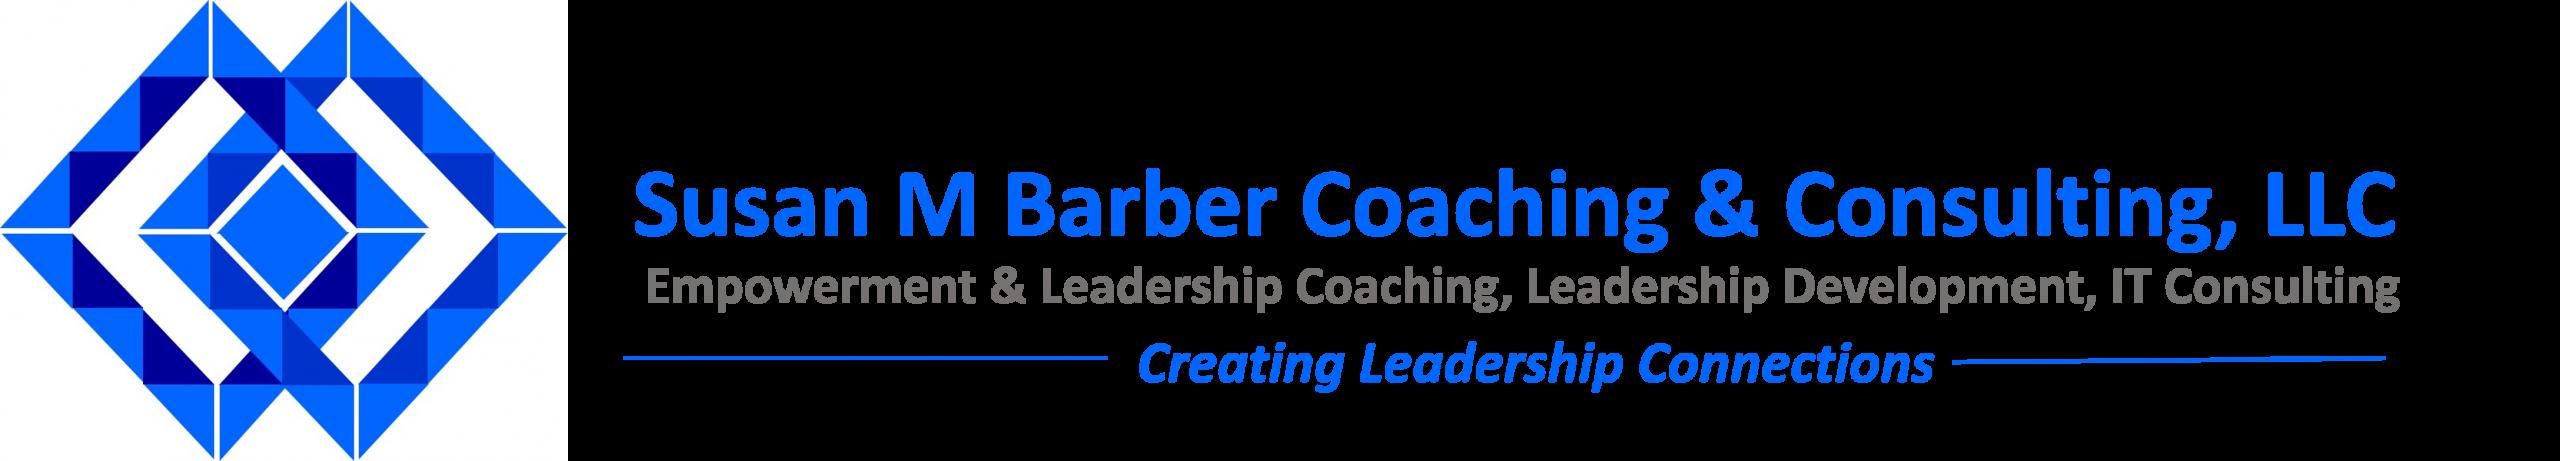 Susan M Barber Coaching & Consulting, LLC